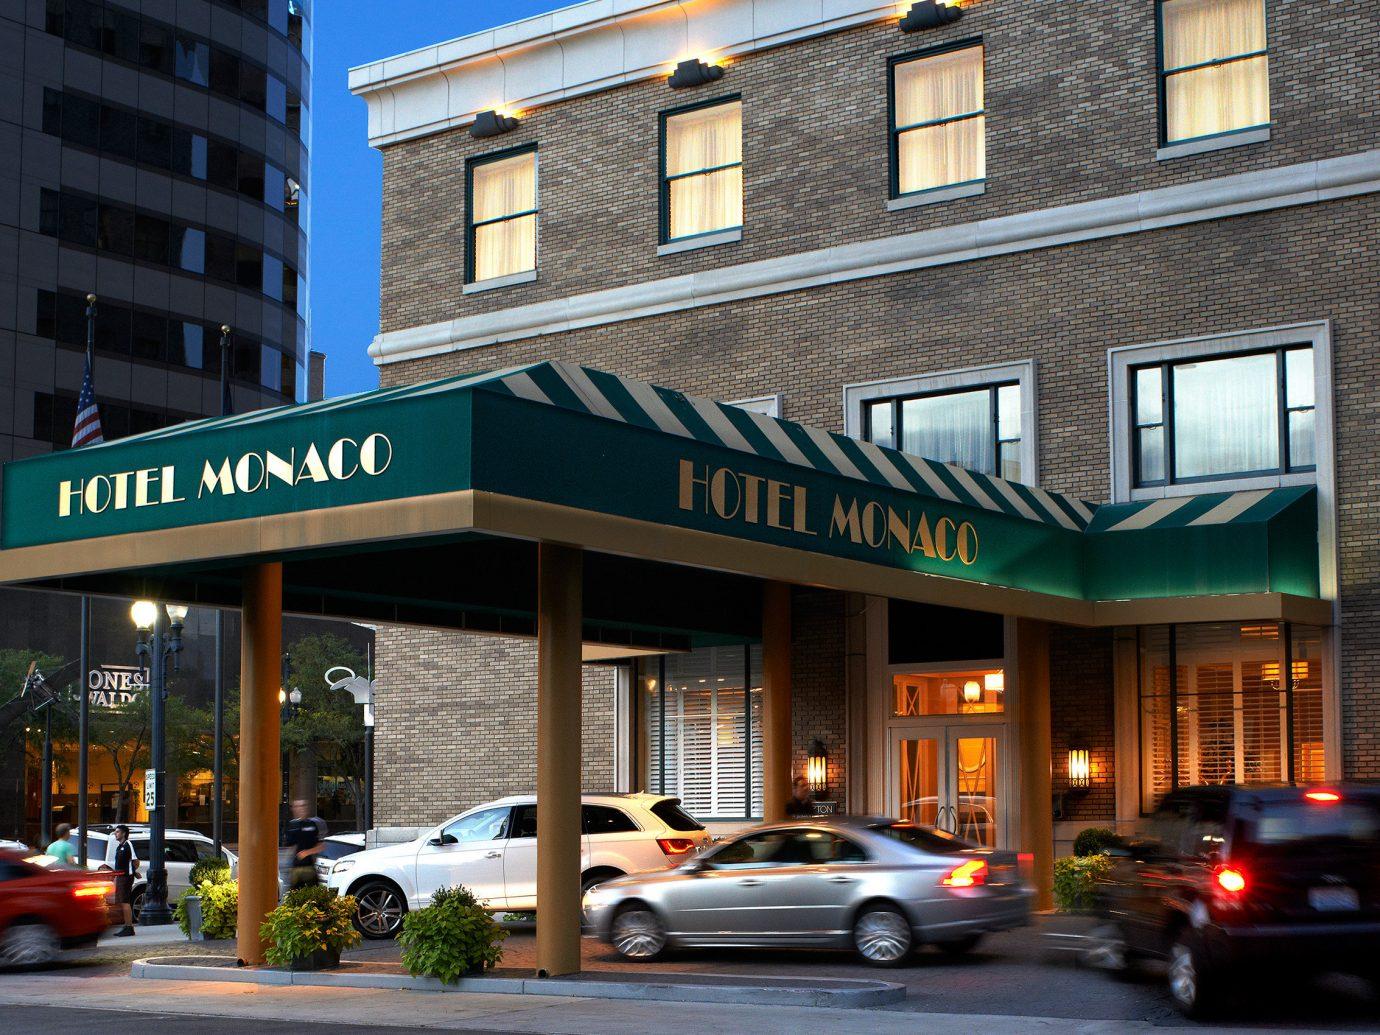 Boutique City Exterior Modern Mountains + Skiing Trip Ideas building outdoor road neighbourhood street Downtown residential area facade restaurant sign